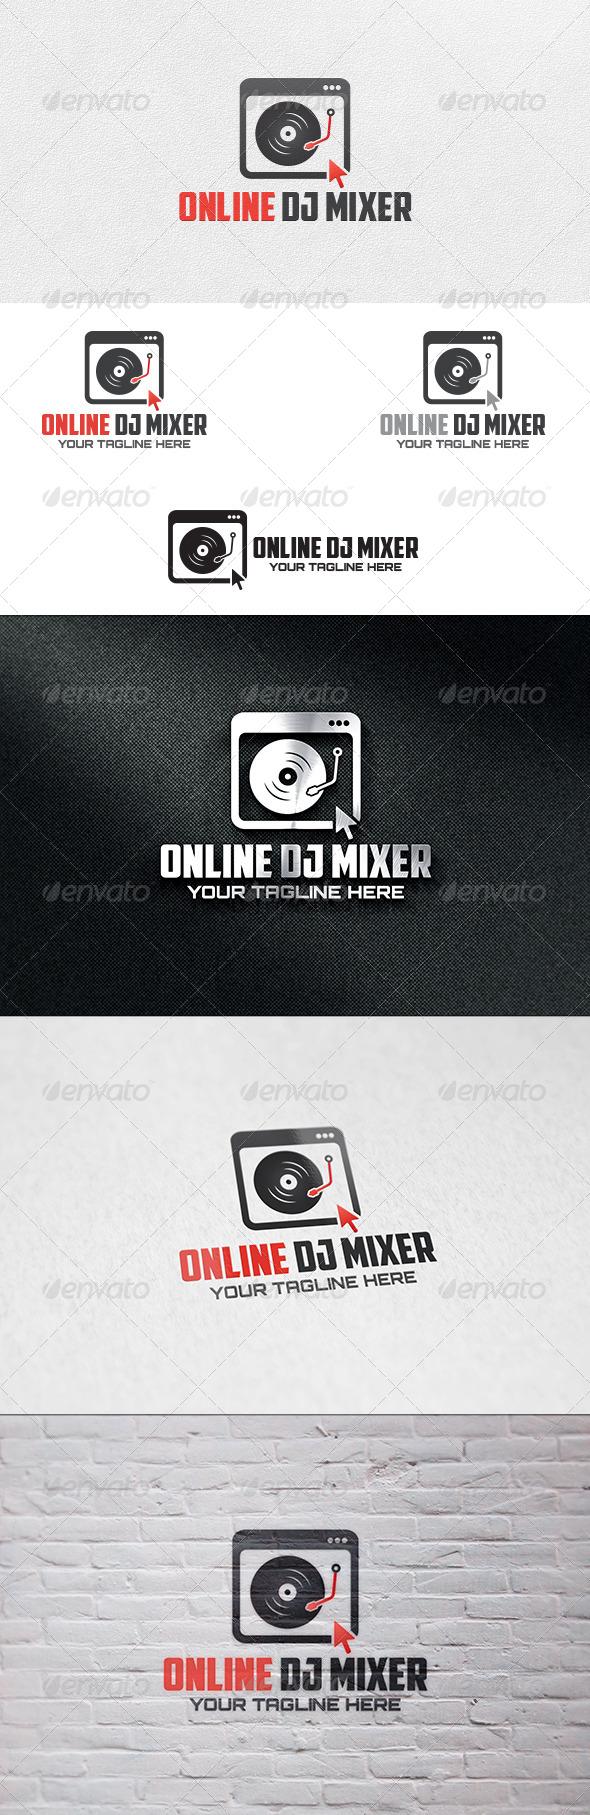 Online DJ Mixer - Logo Template - Symbols Logo Templates